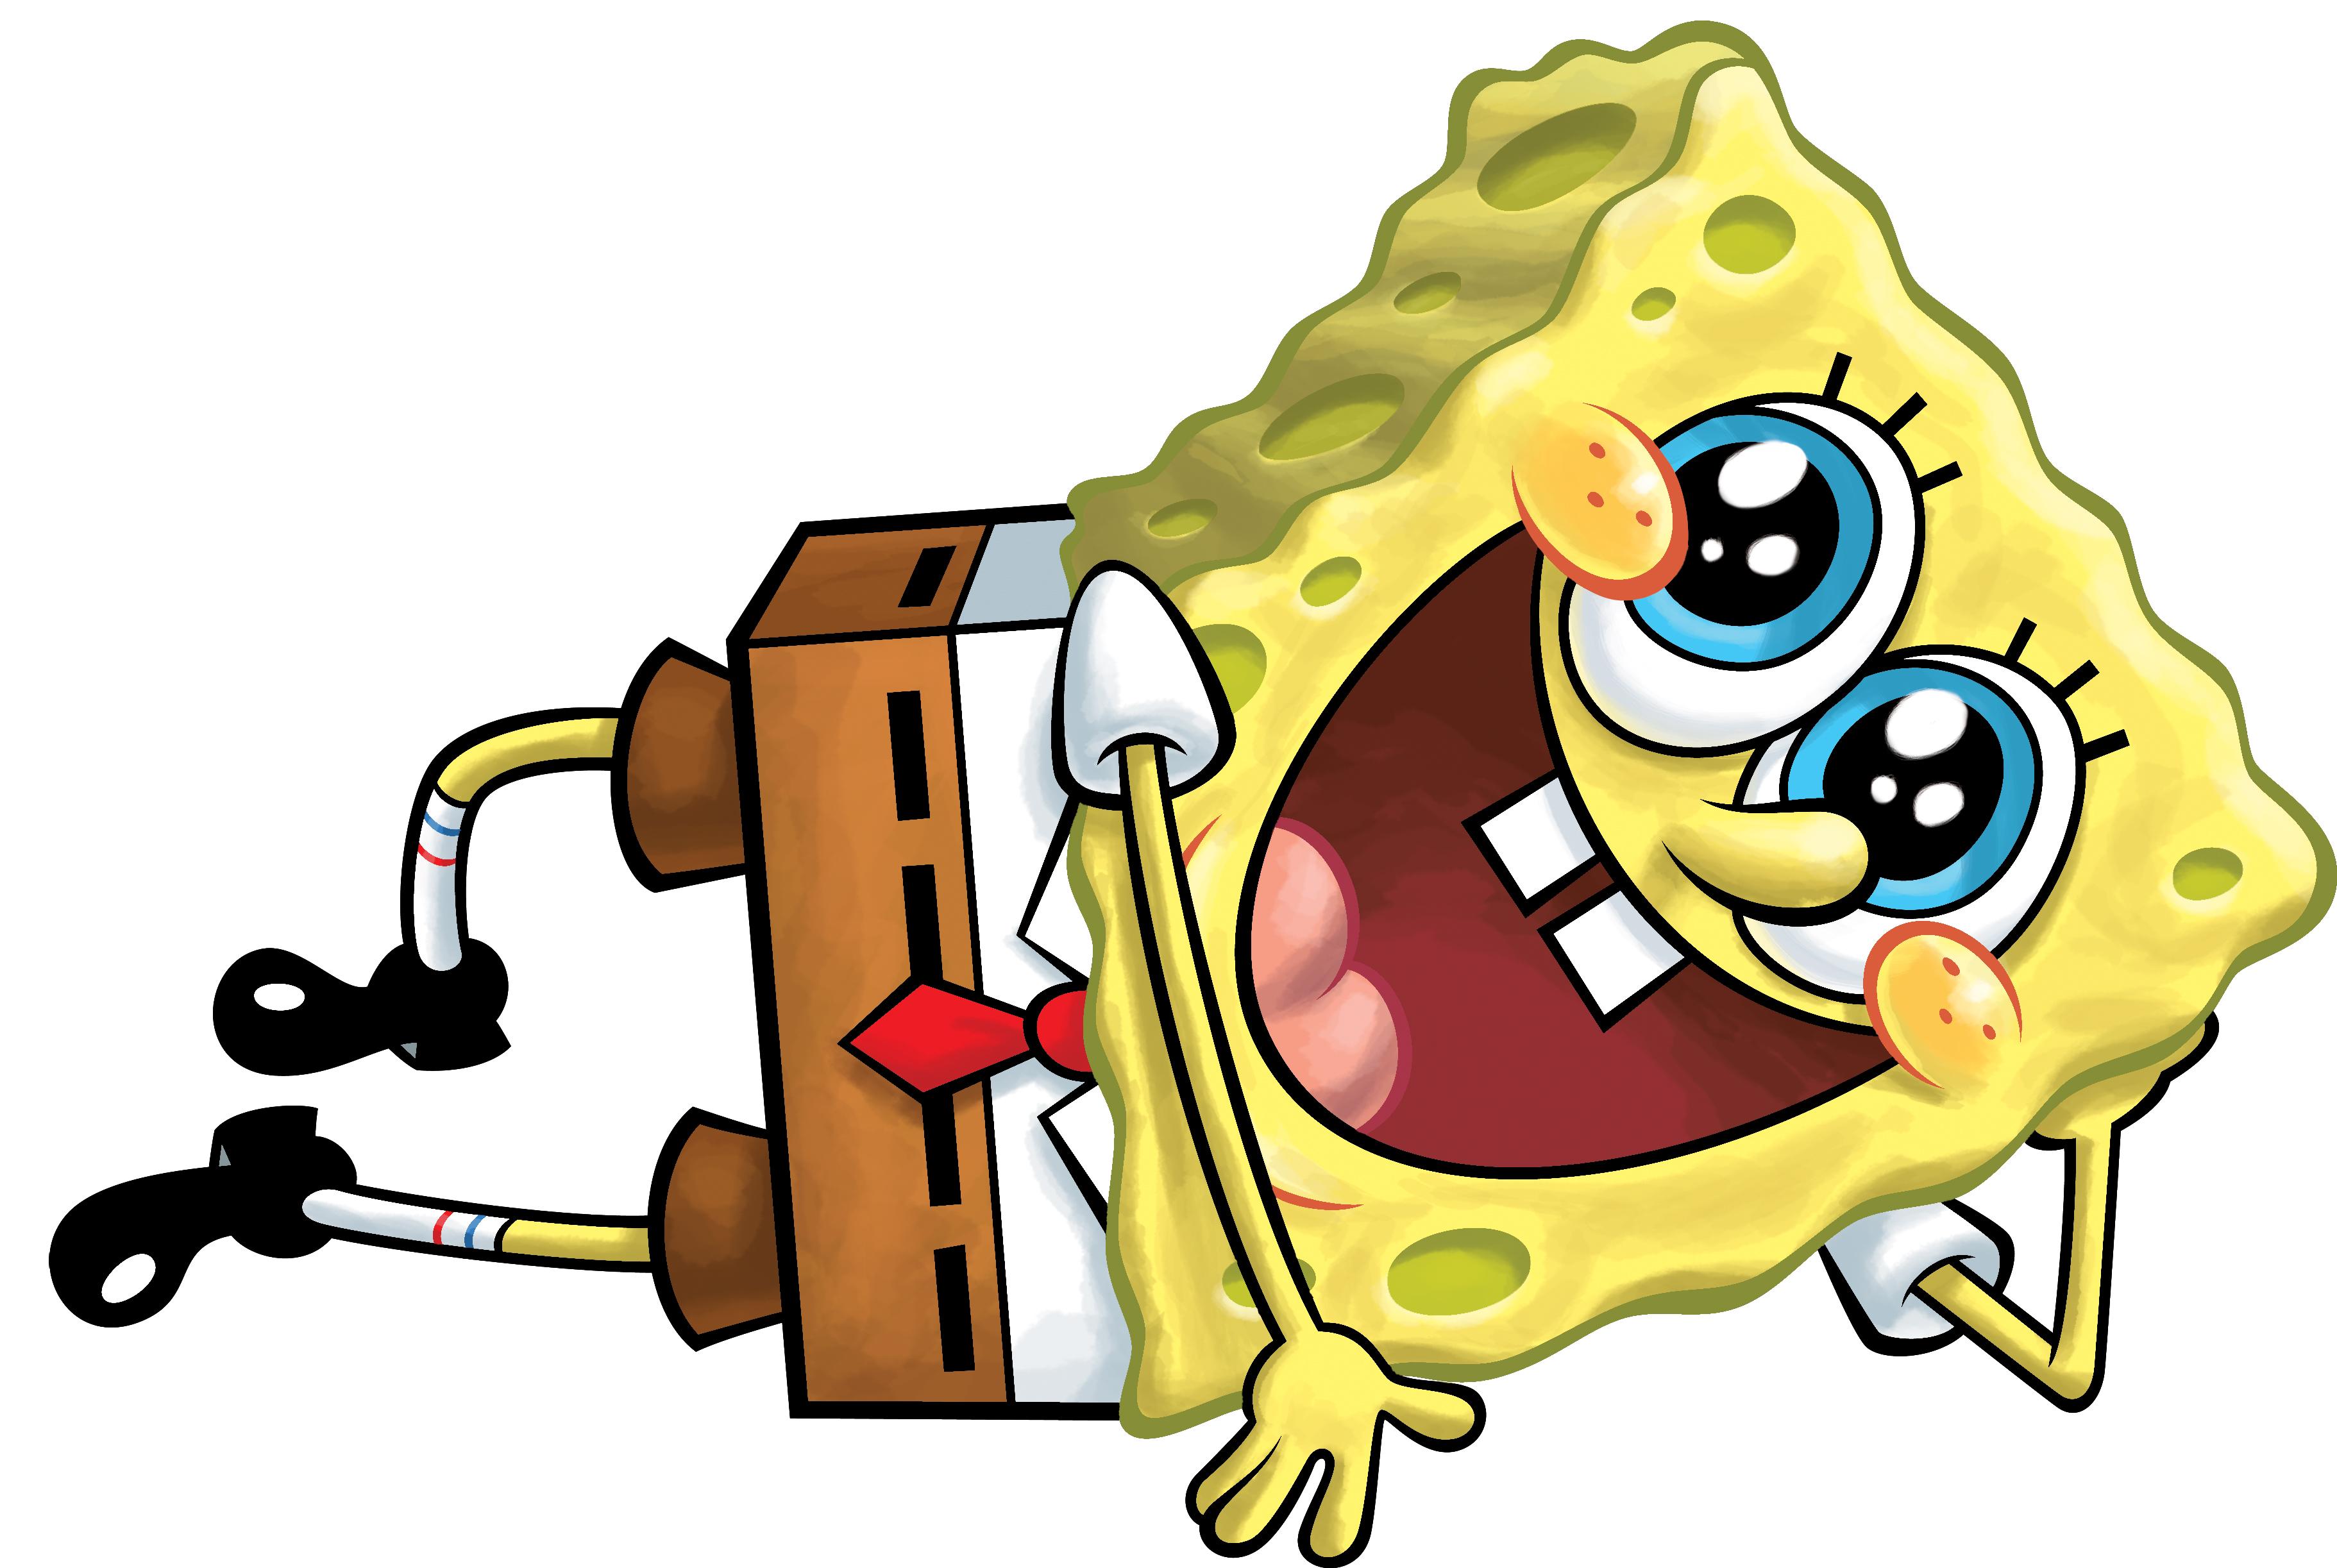 http://static.tumblr.com/f1bbfdf0fd794b1cf8d243d65644be01/i0ldeup/bURmj2ccf/tumblr_static_spongebob.jpg